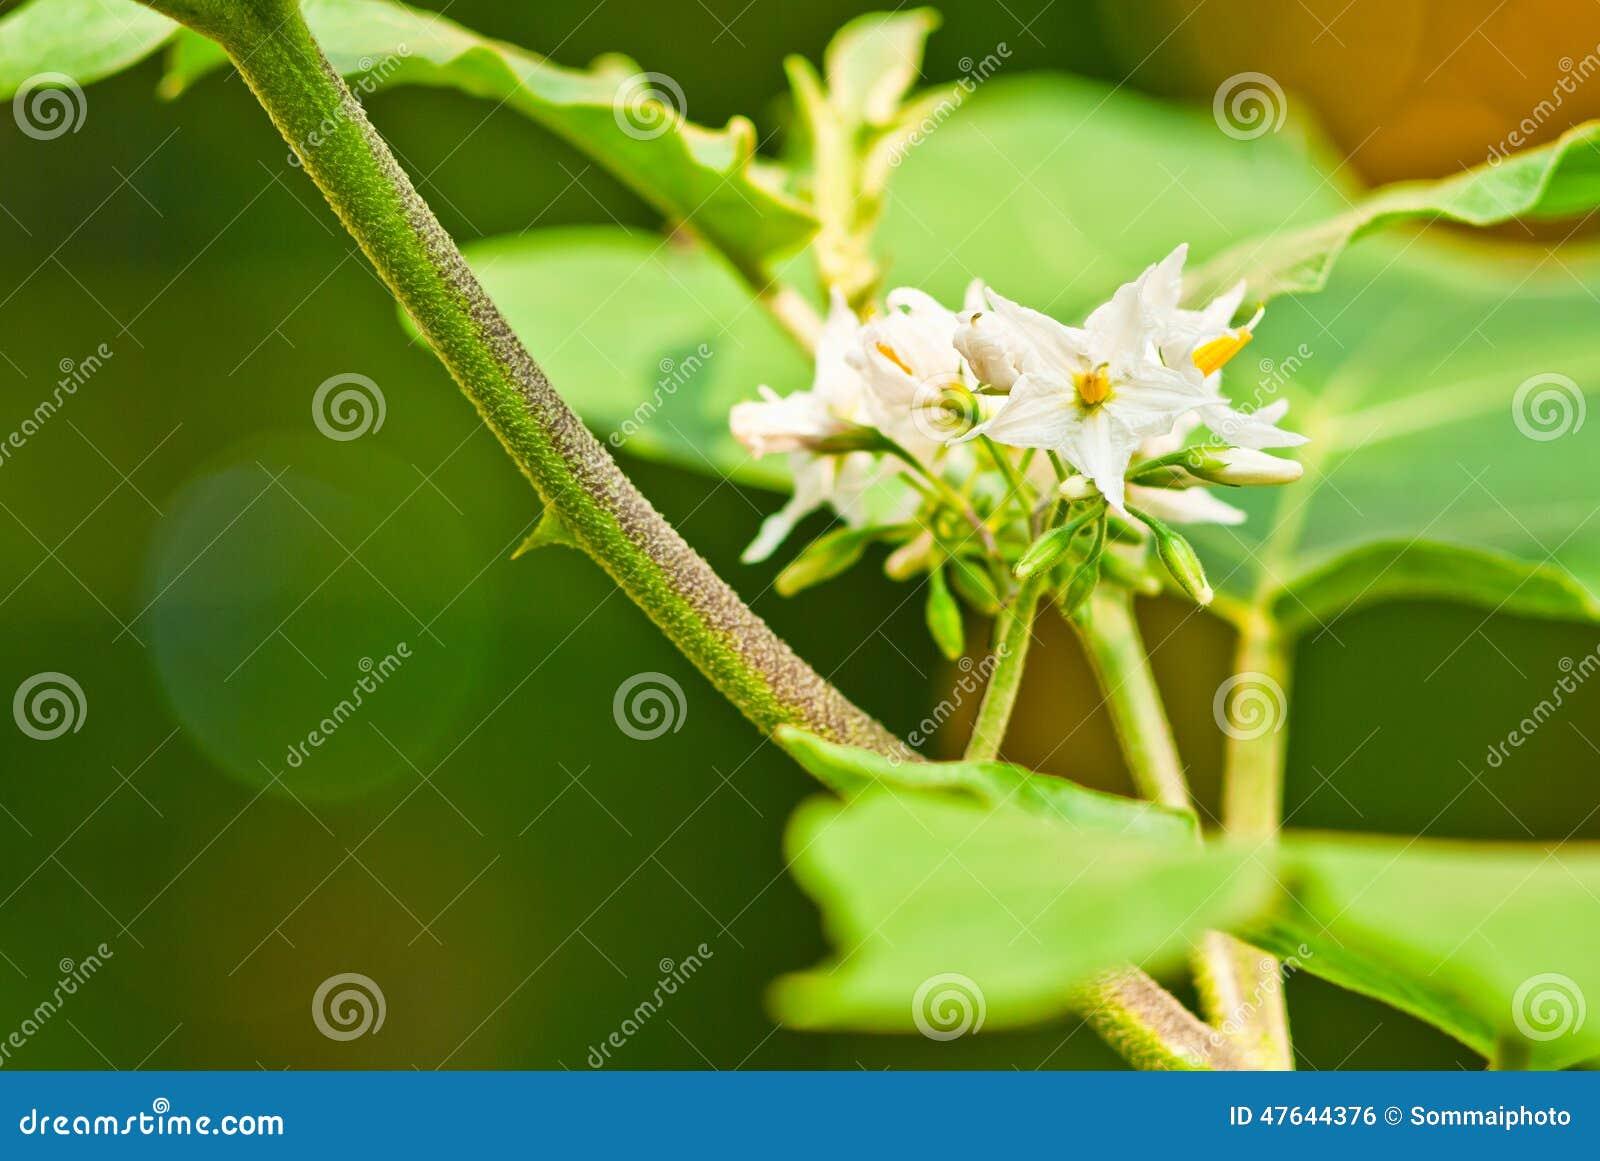 Eggplant White Flower Stock Photo Image Of White Bright 47644376